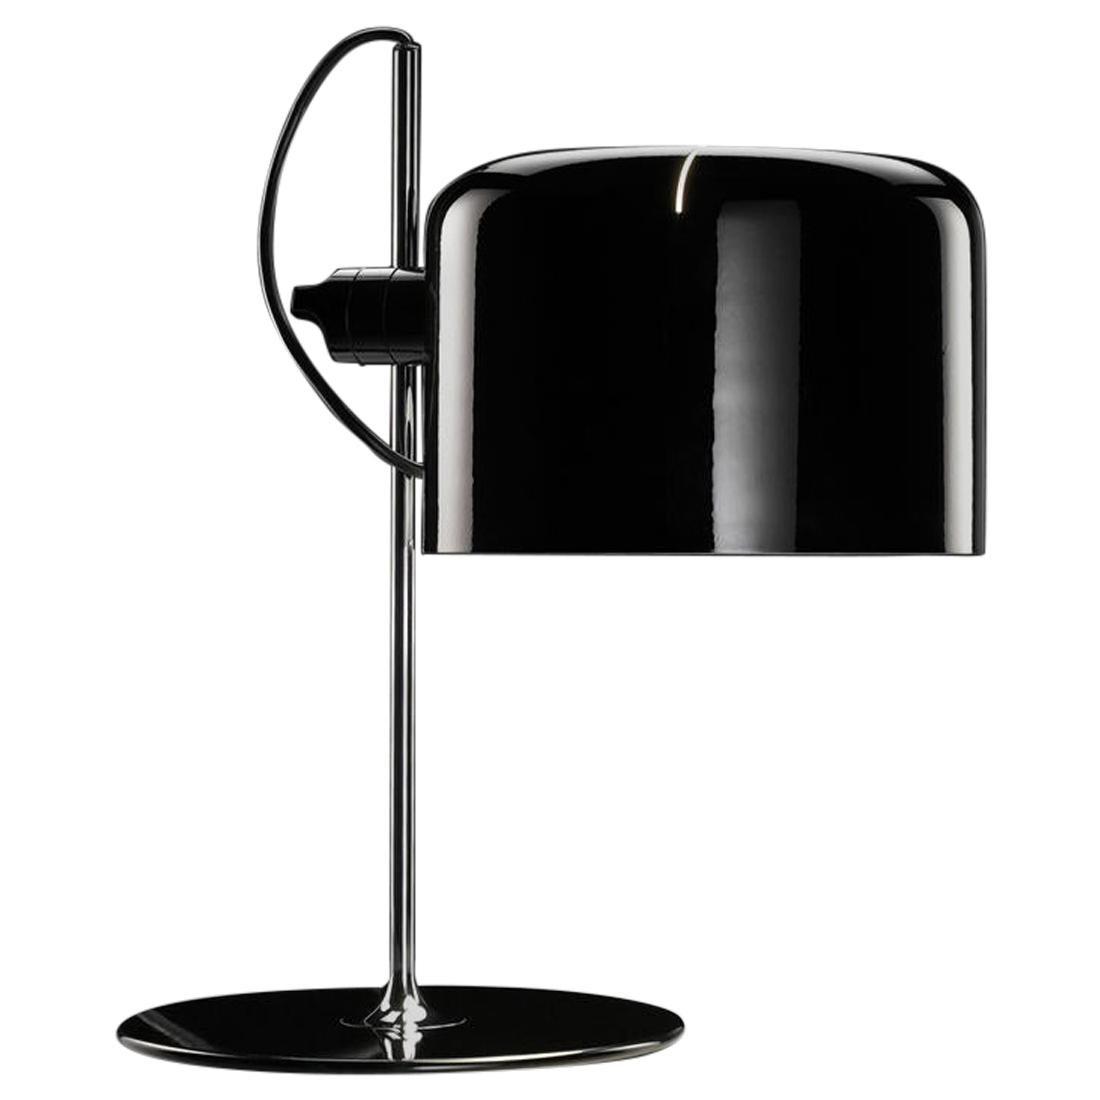 "Joe Colombo Model #2202 ""Coupé"" Table Lamp in Black for Oluce"